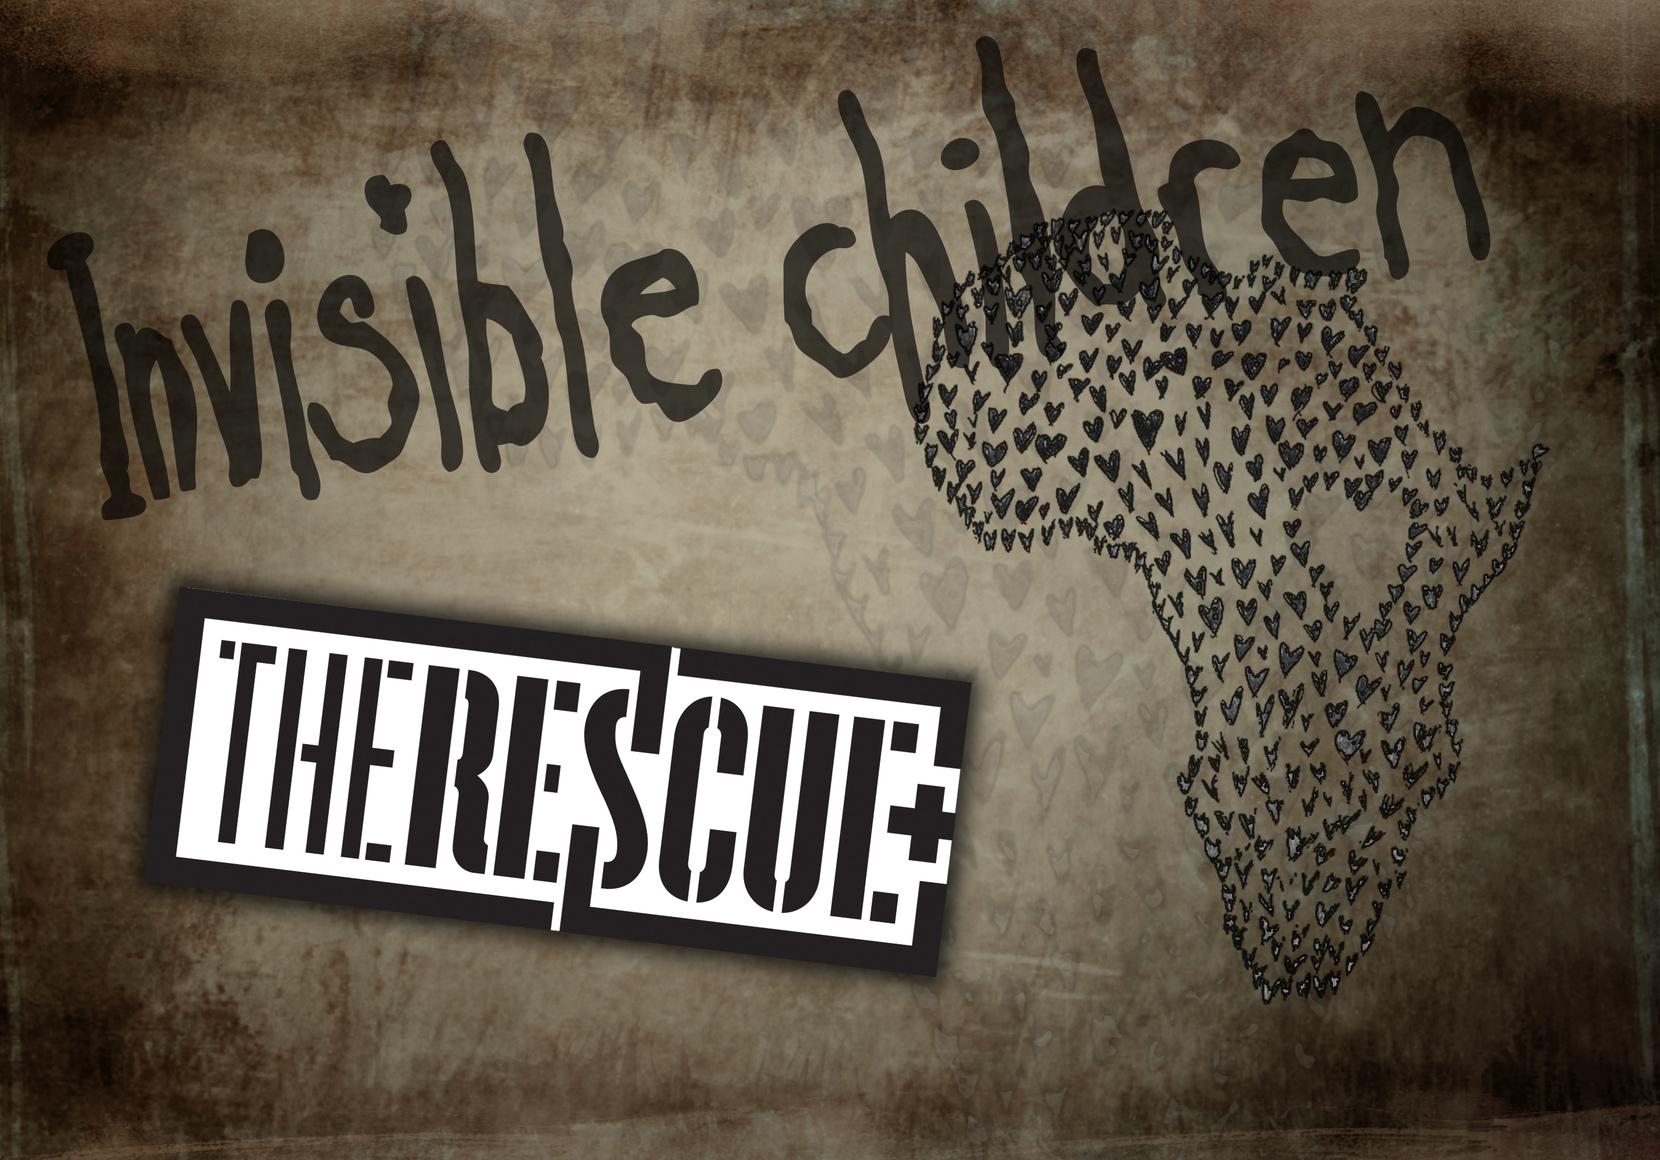 Invisible Children Events Benefit Ugandan Relief